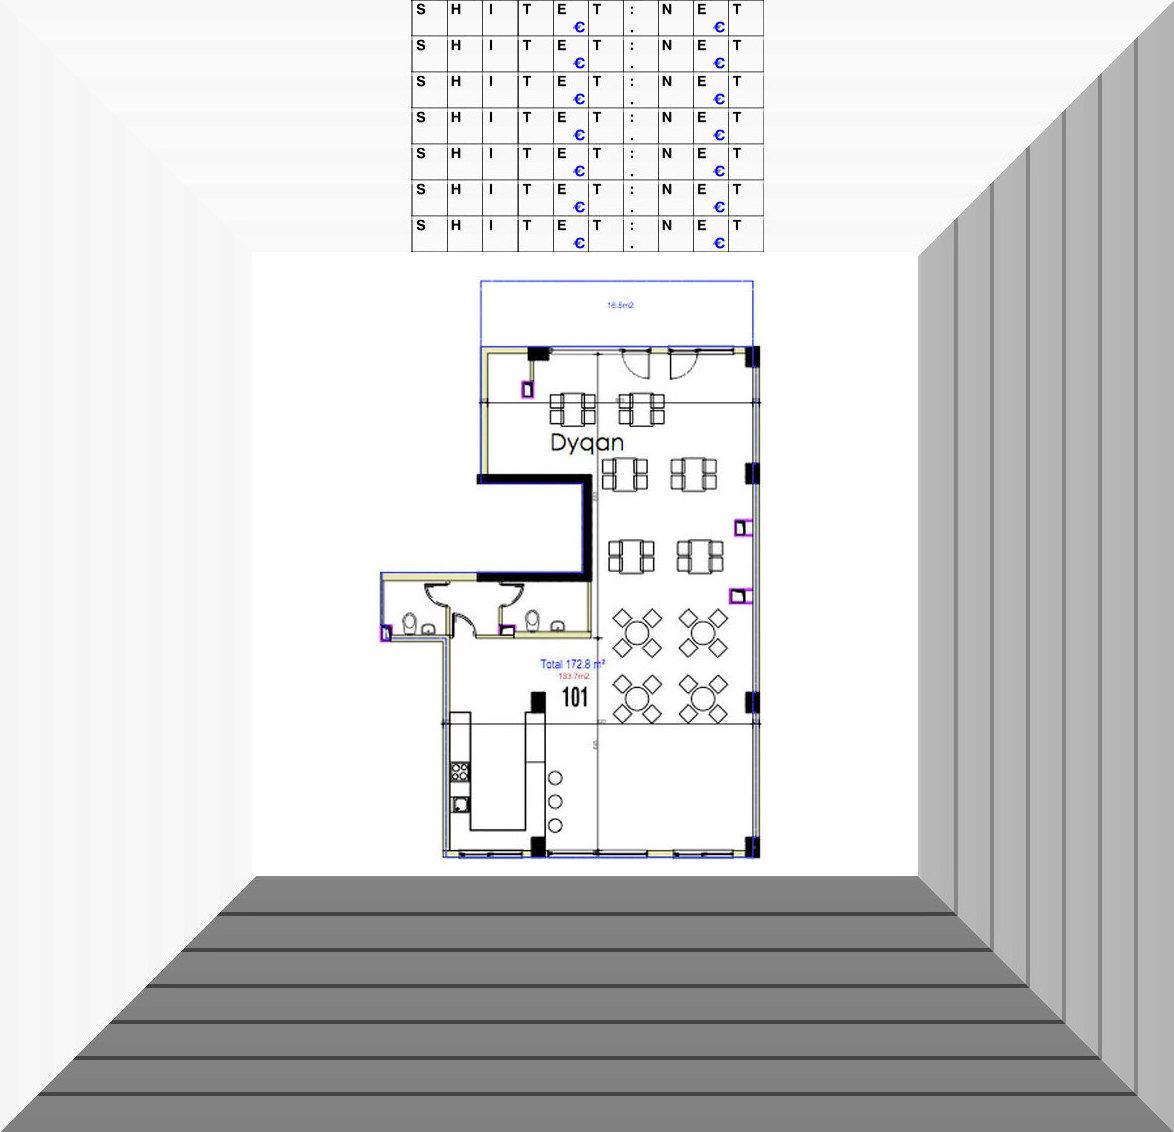 Shitet Ambient BIznesi 172 m2